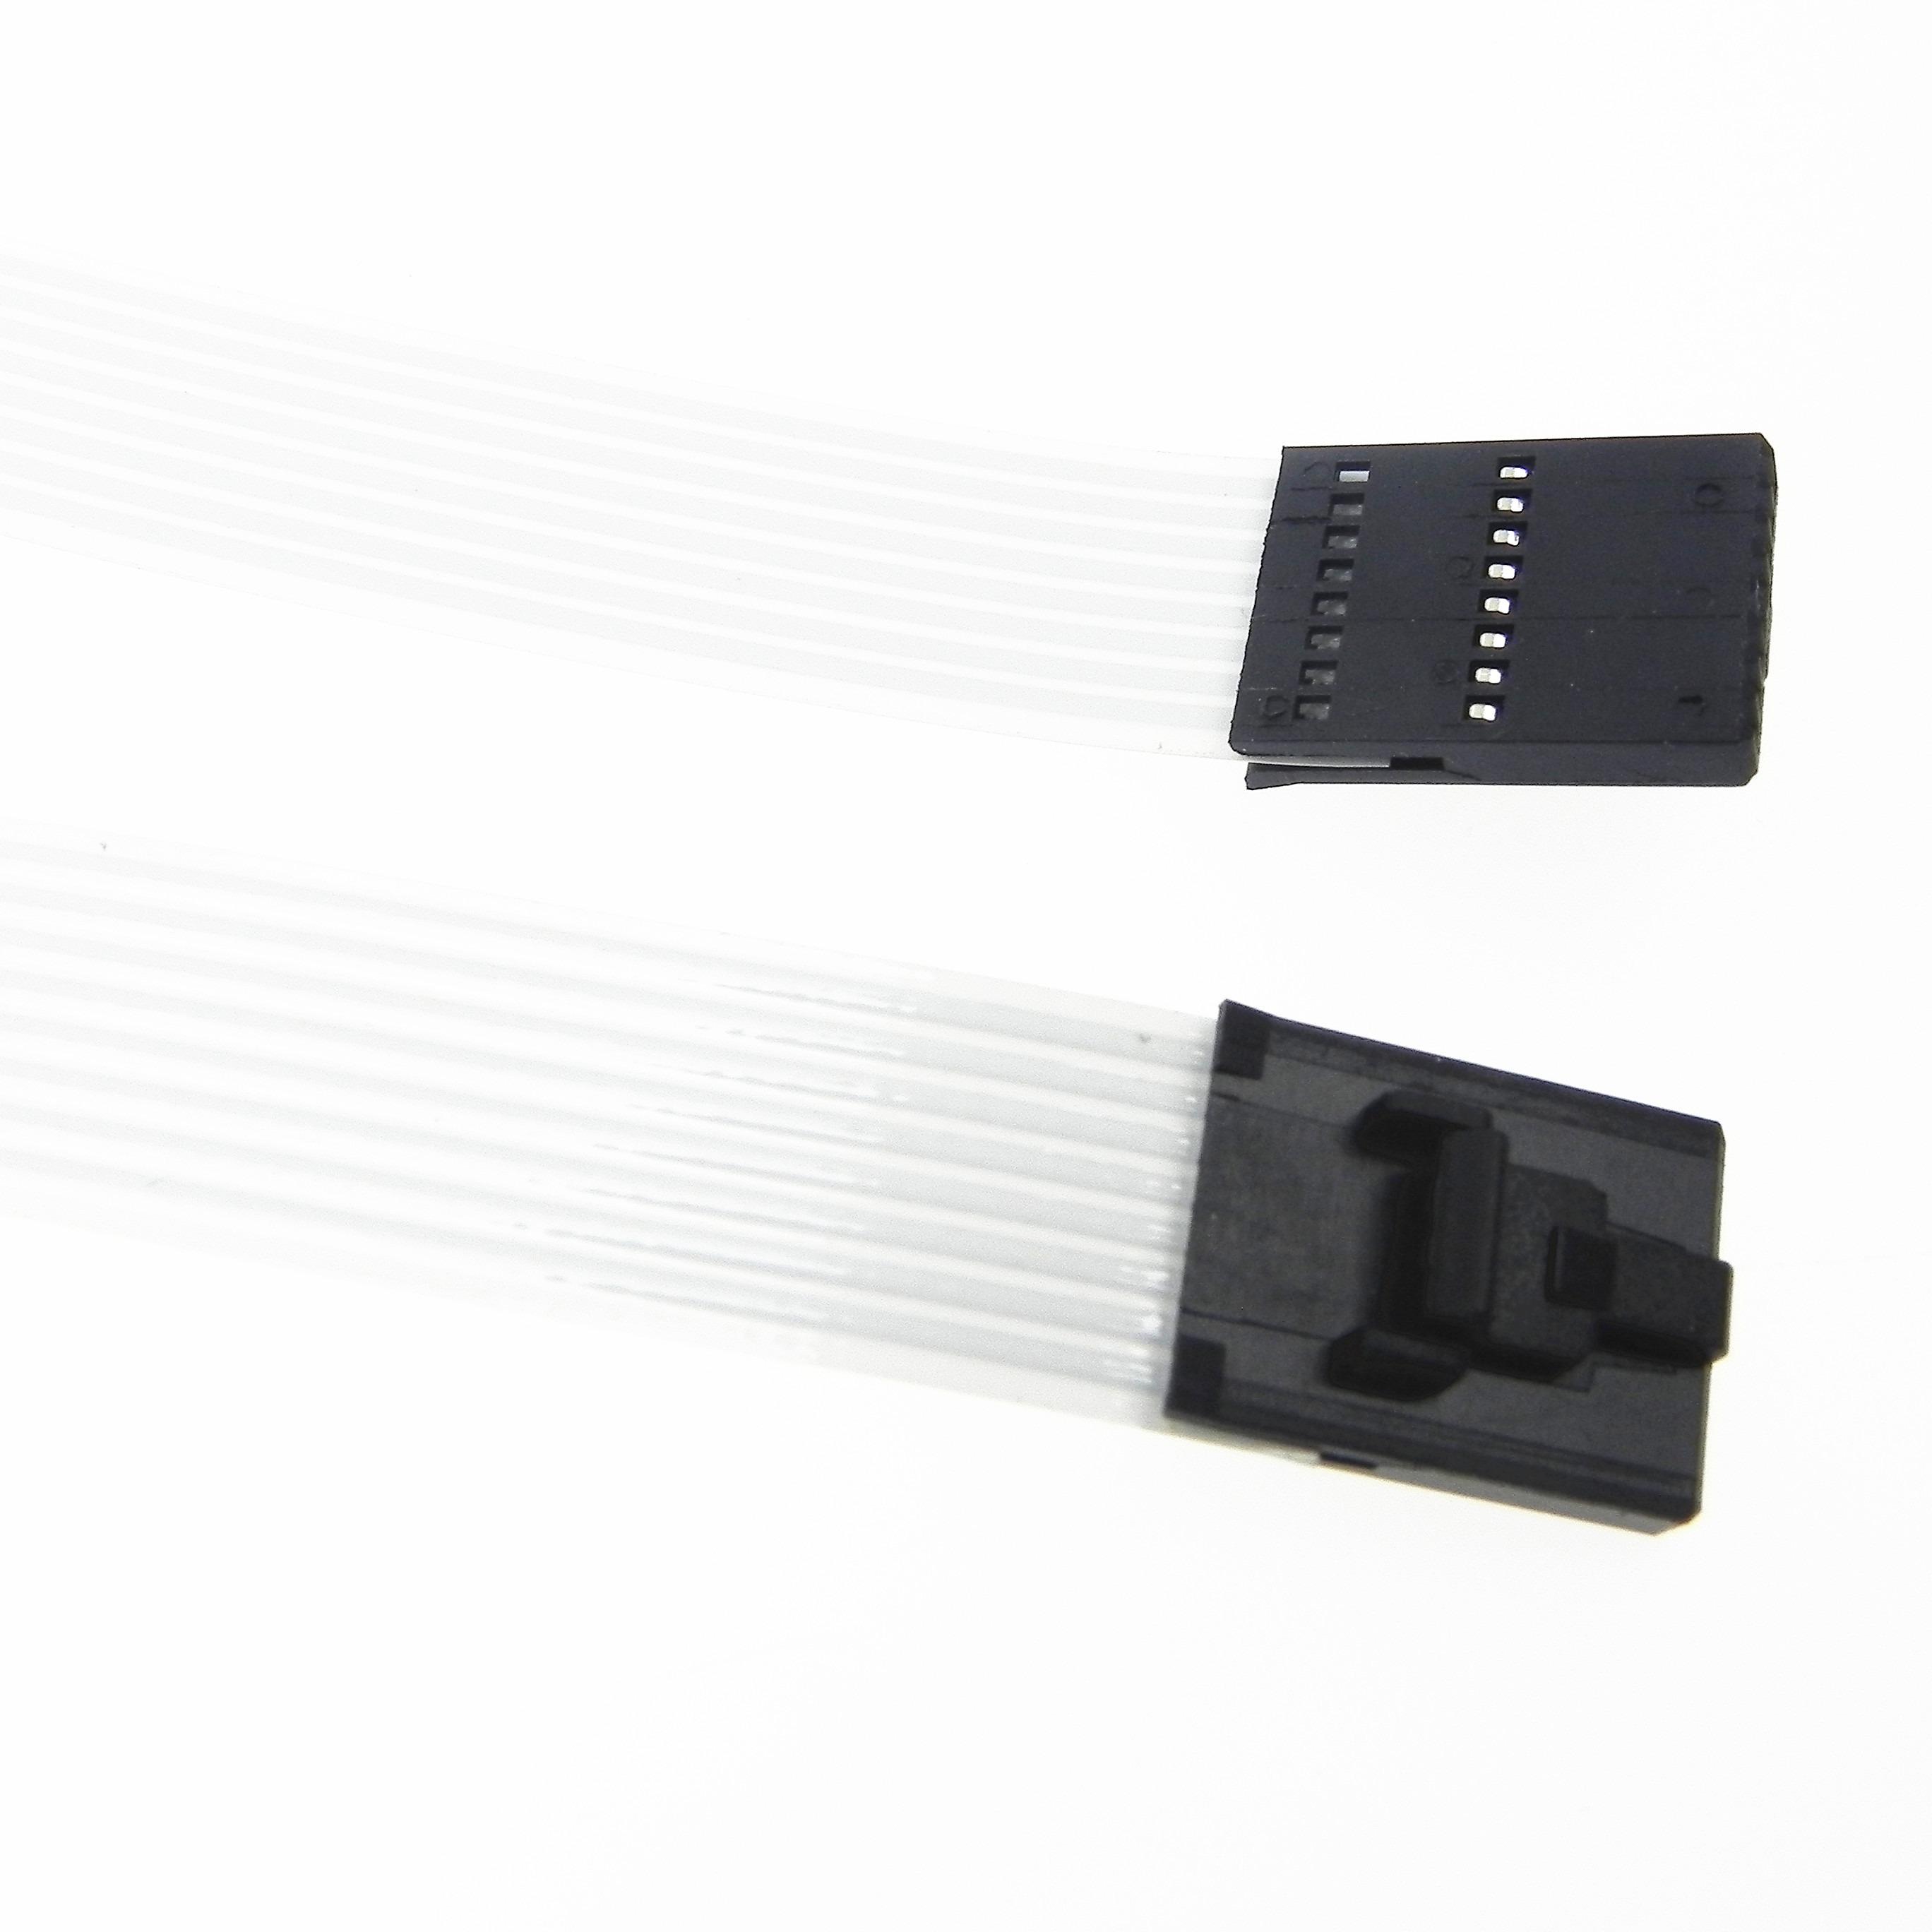 8pin 210mm long E type Flat cable